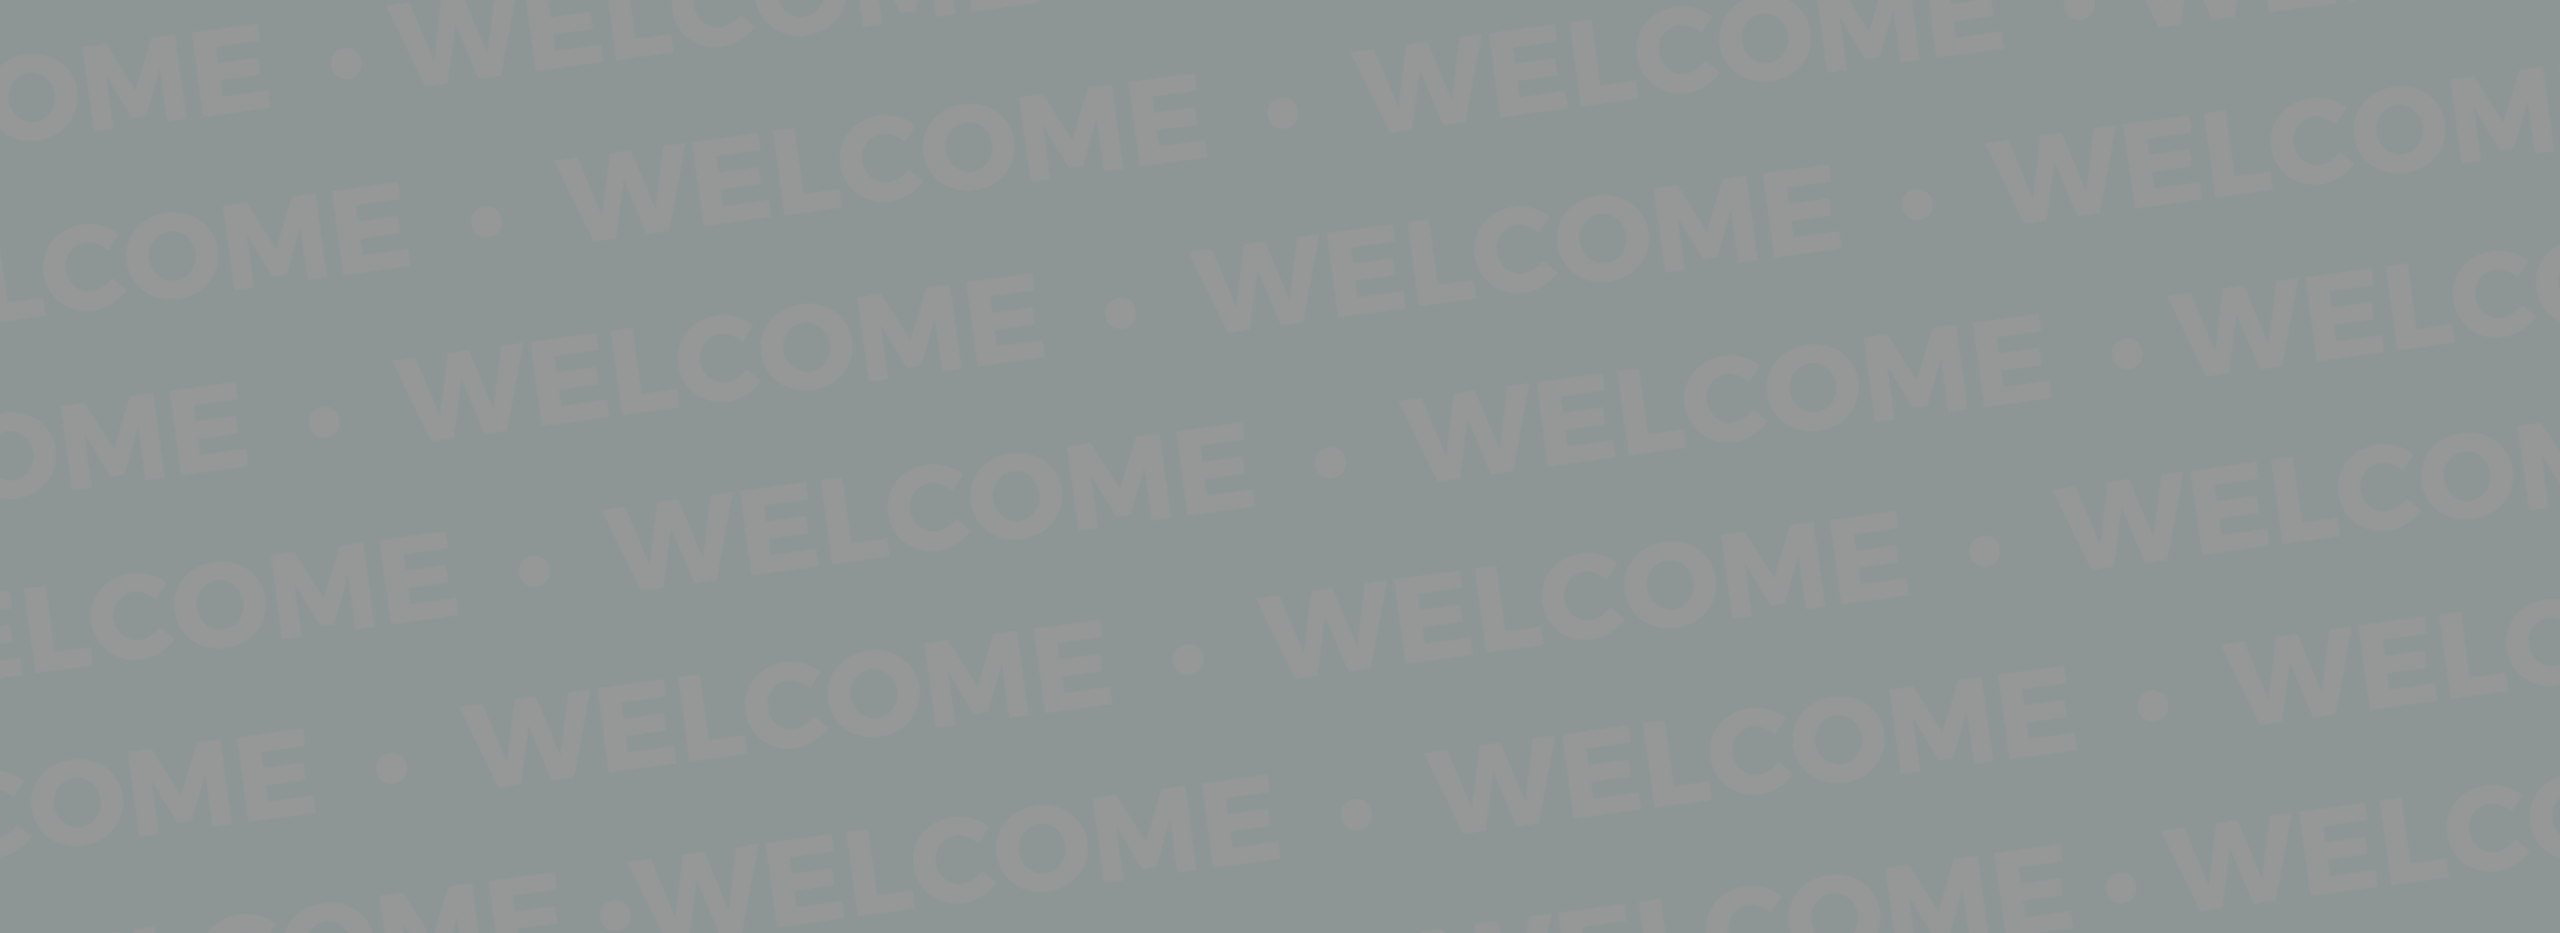 MRE | AP Welcomes New Agent Esther Caulton